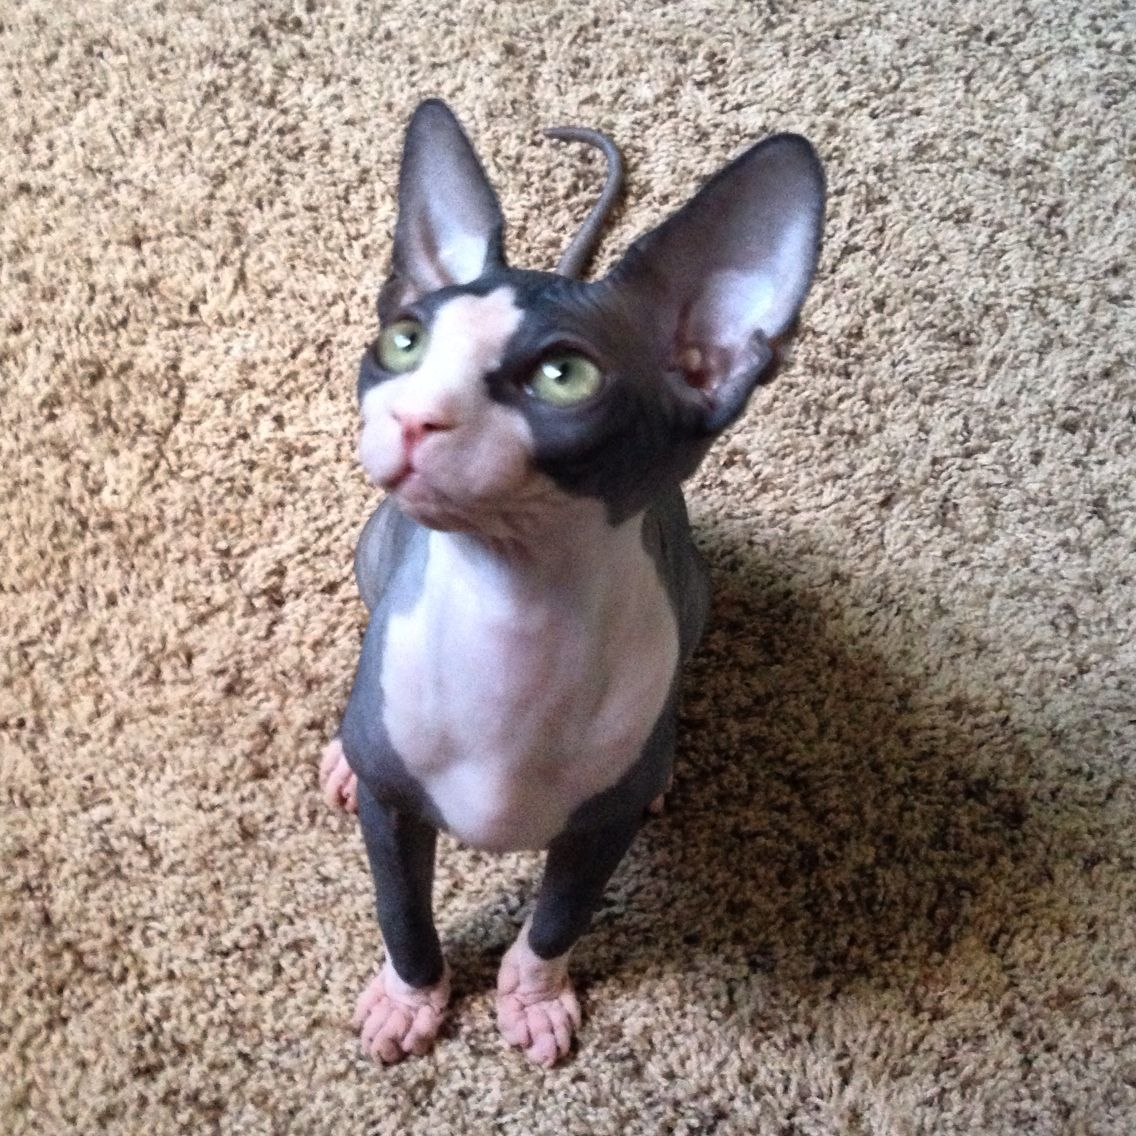 Tuxedo Sphynx Kitten! Sparkly eyes!